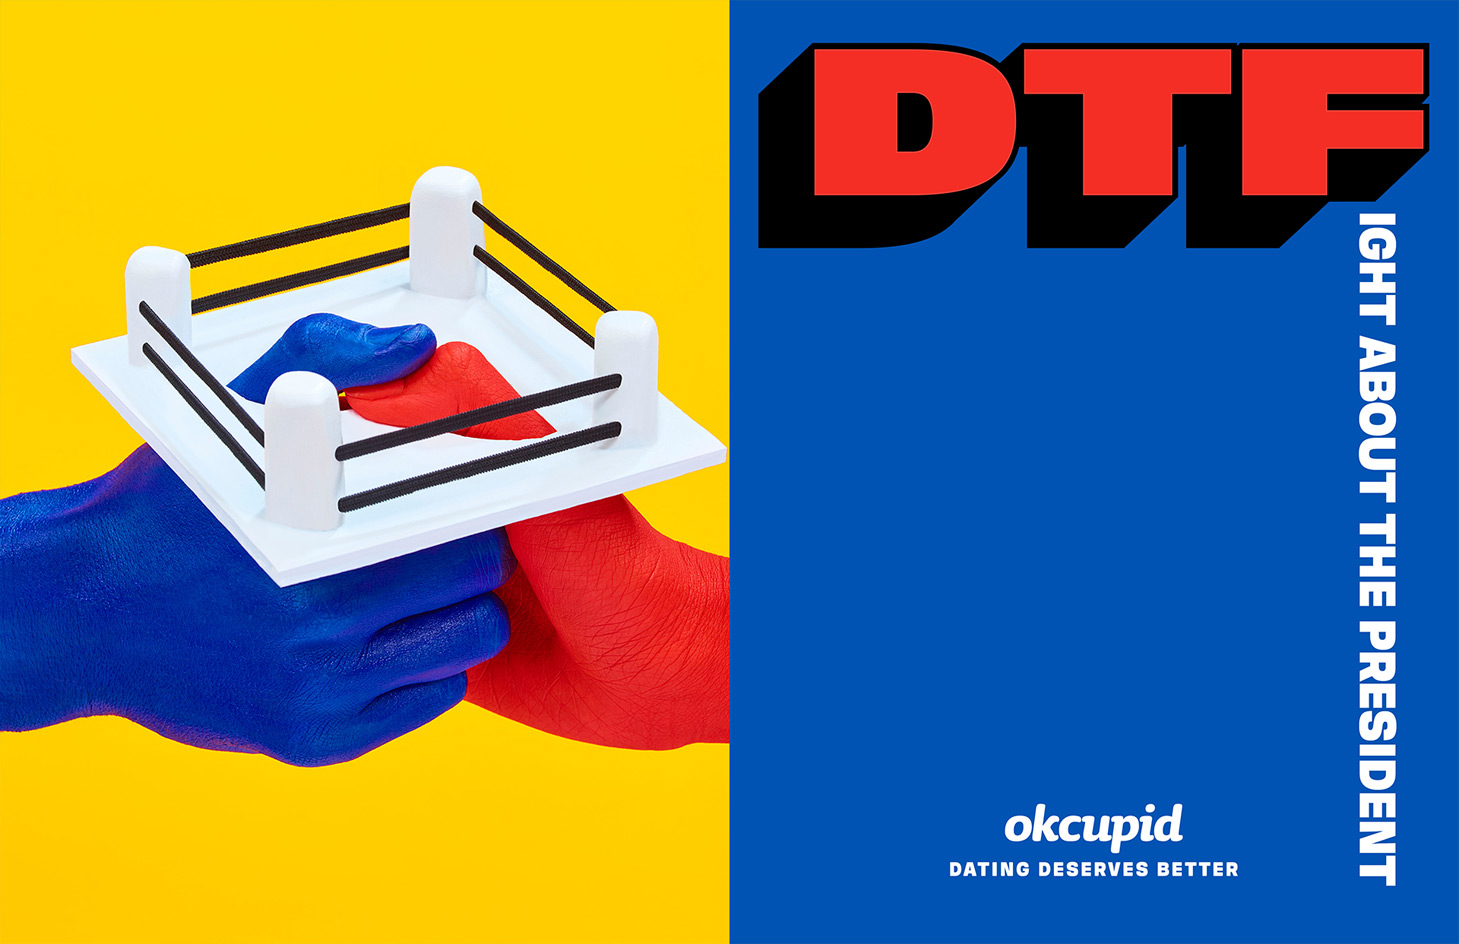 siti di incontri simili a OkCupid